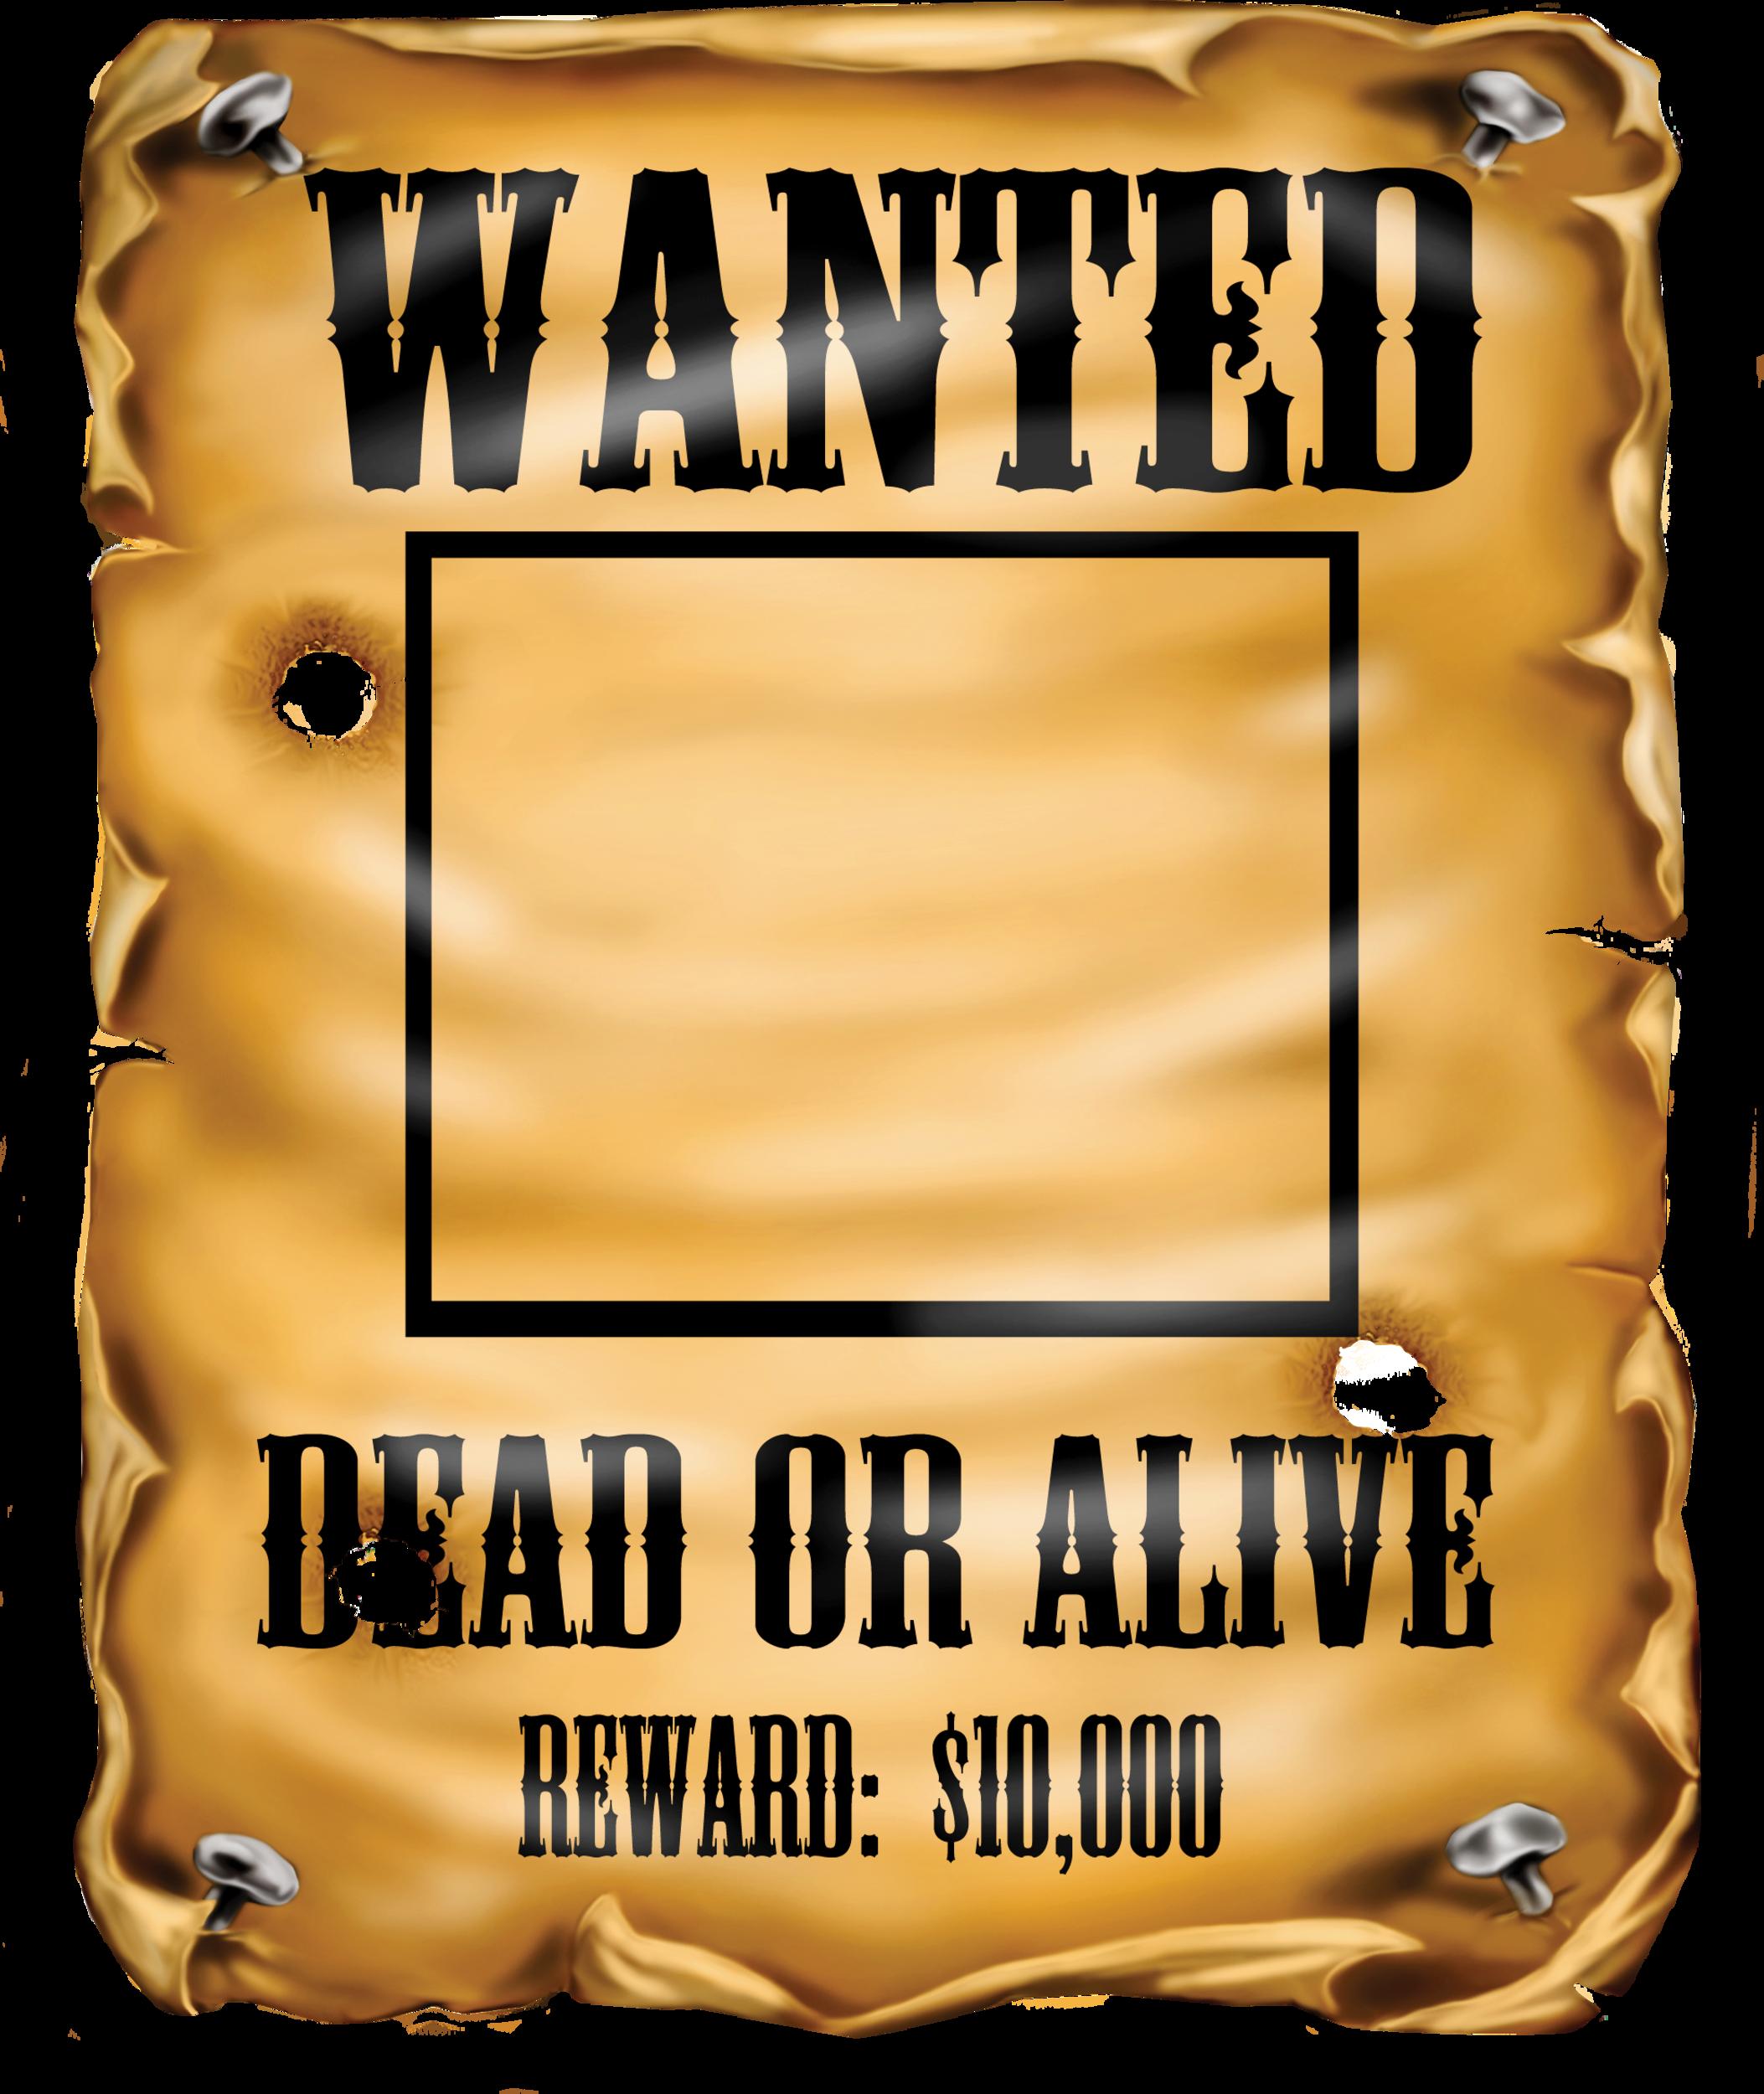 Shirt Clip Art Home Cowboy Wanted Poster Wanted Poster